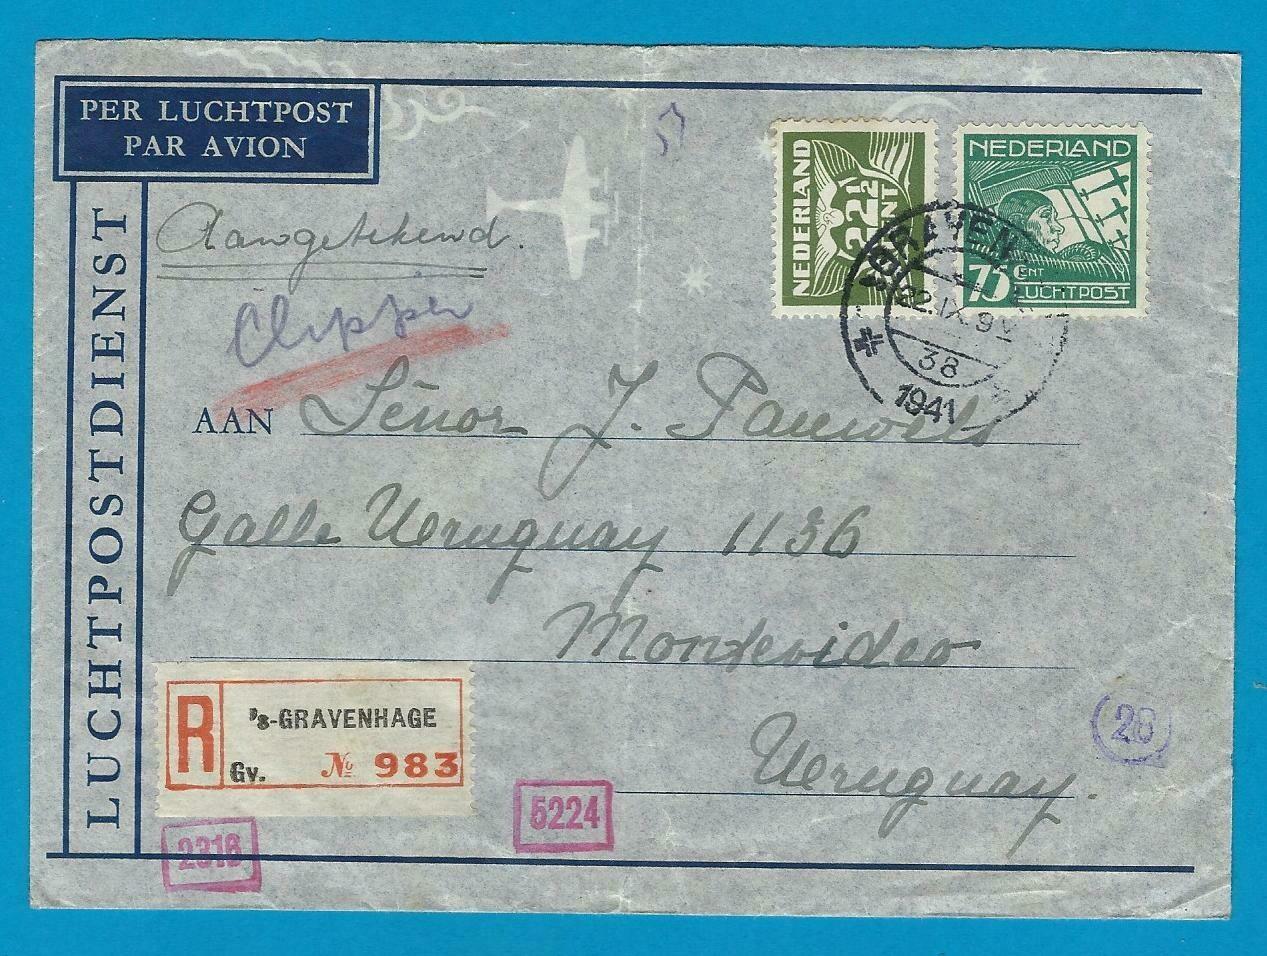 NEDERLAND R lp brief 1941 Den Haag naar Uruguay